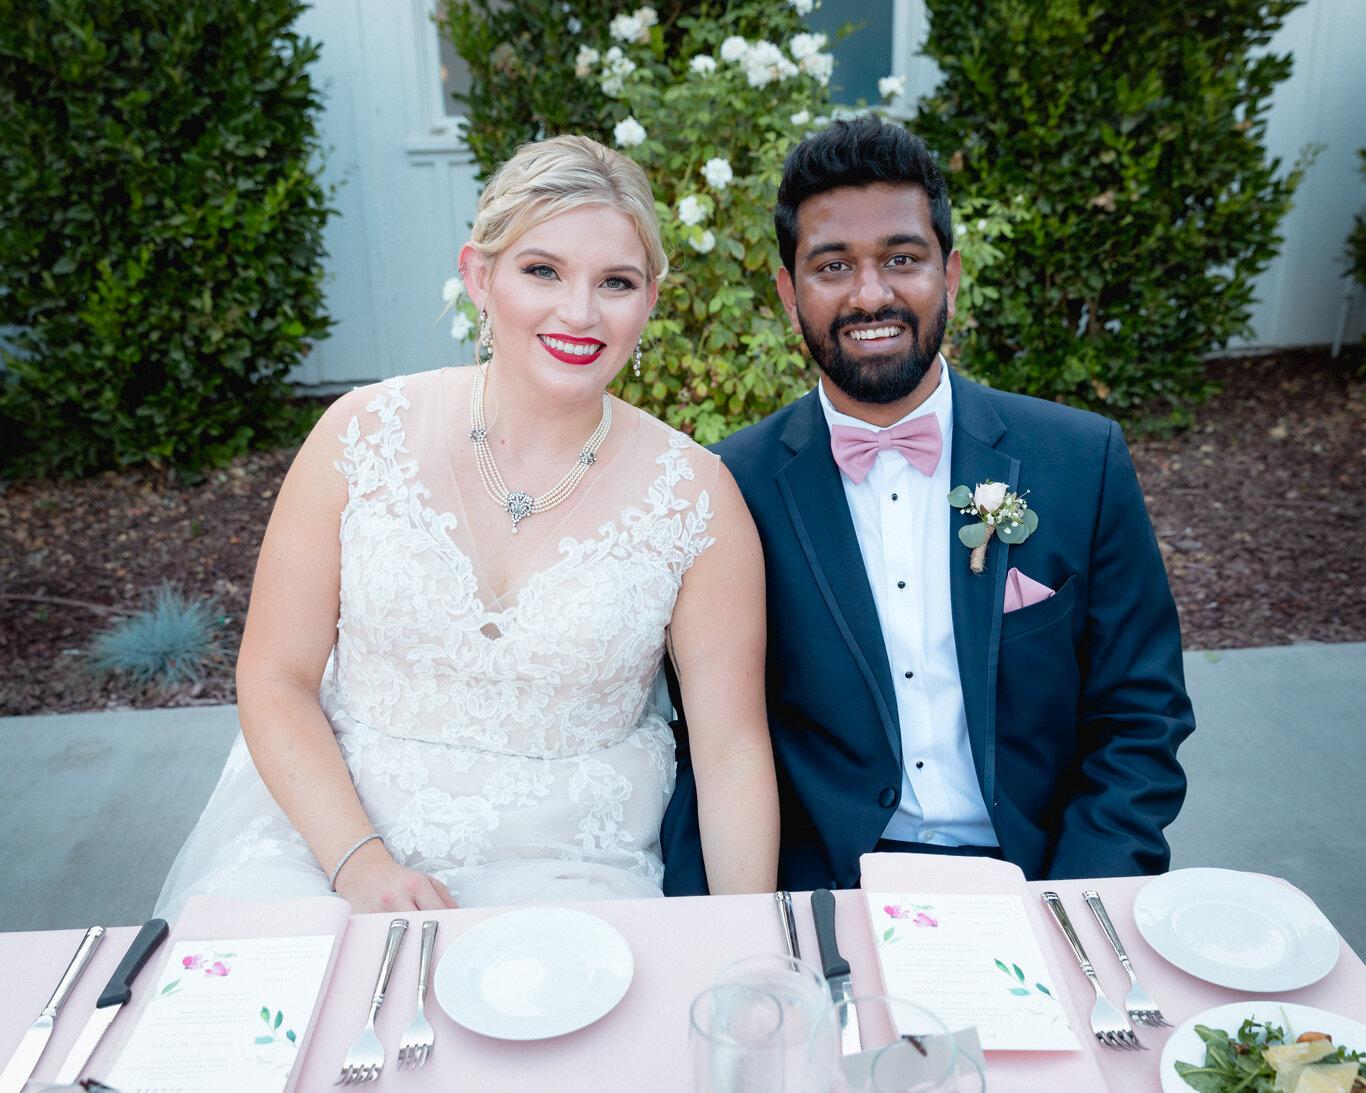 2019.08.24_Emily-Ashir-Wedding-at-the-Maples-6189.jpg